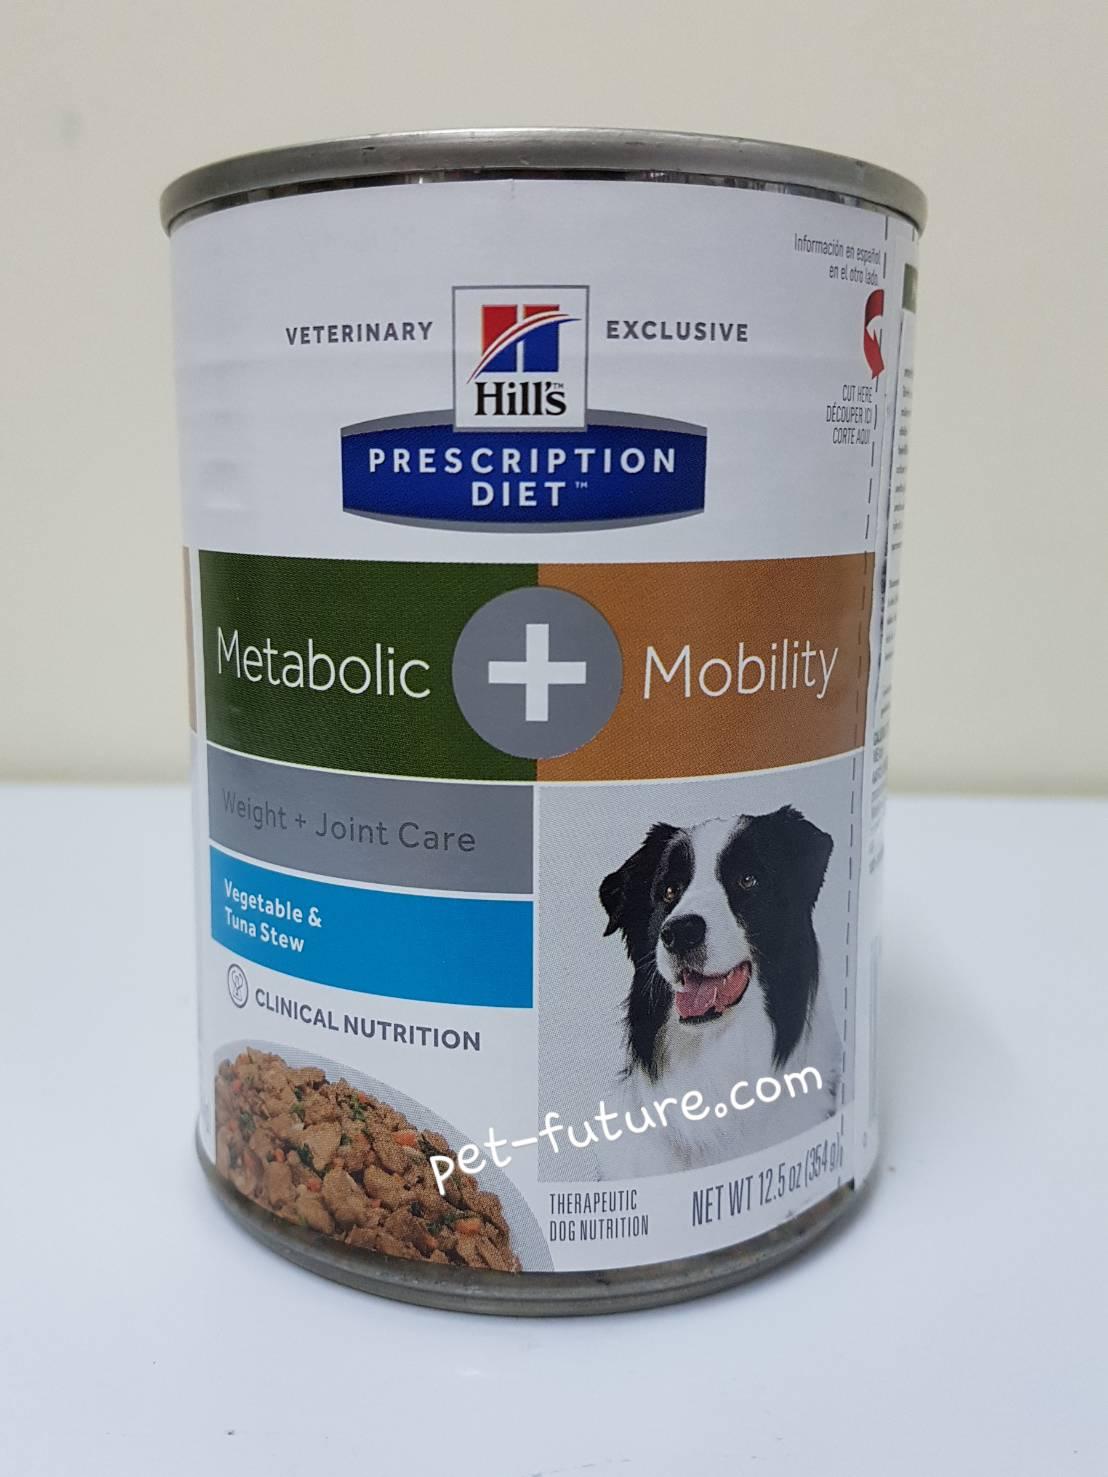 Metabolic+Mobility 354 กรัม (New product) ของเข้ามาใหม่ค่ะ Exp. 11/18 (115*12)